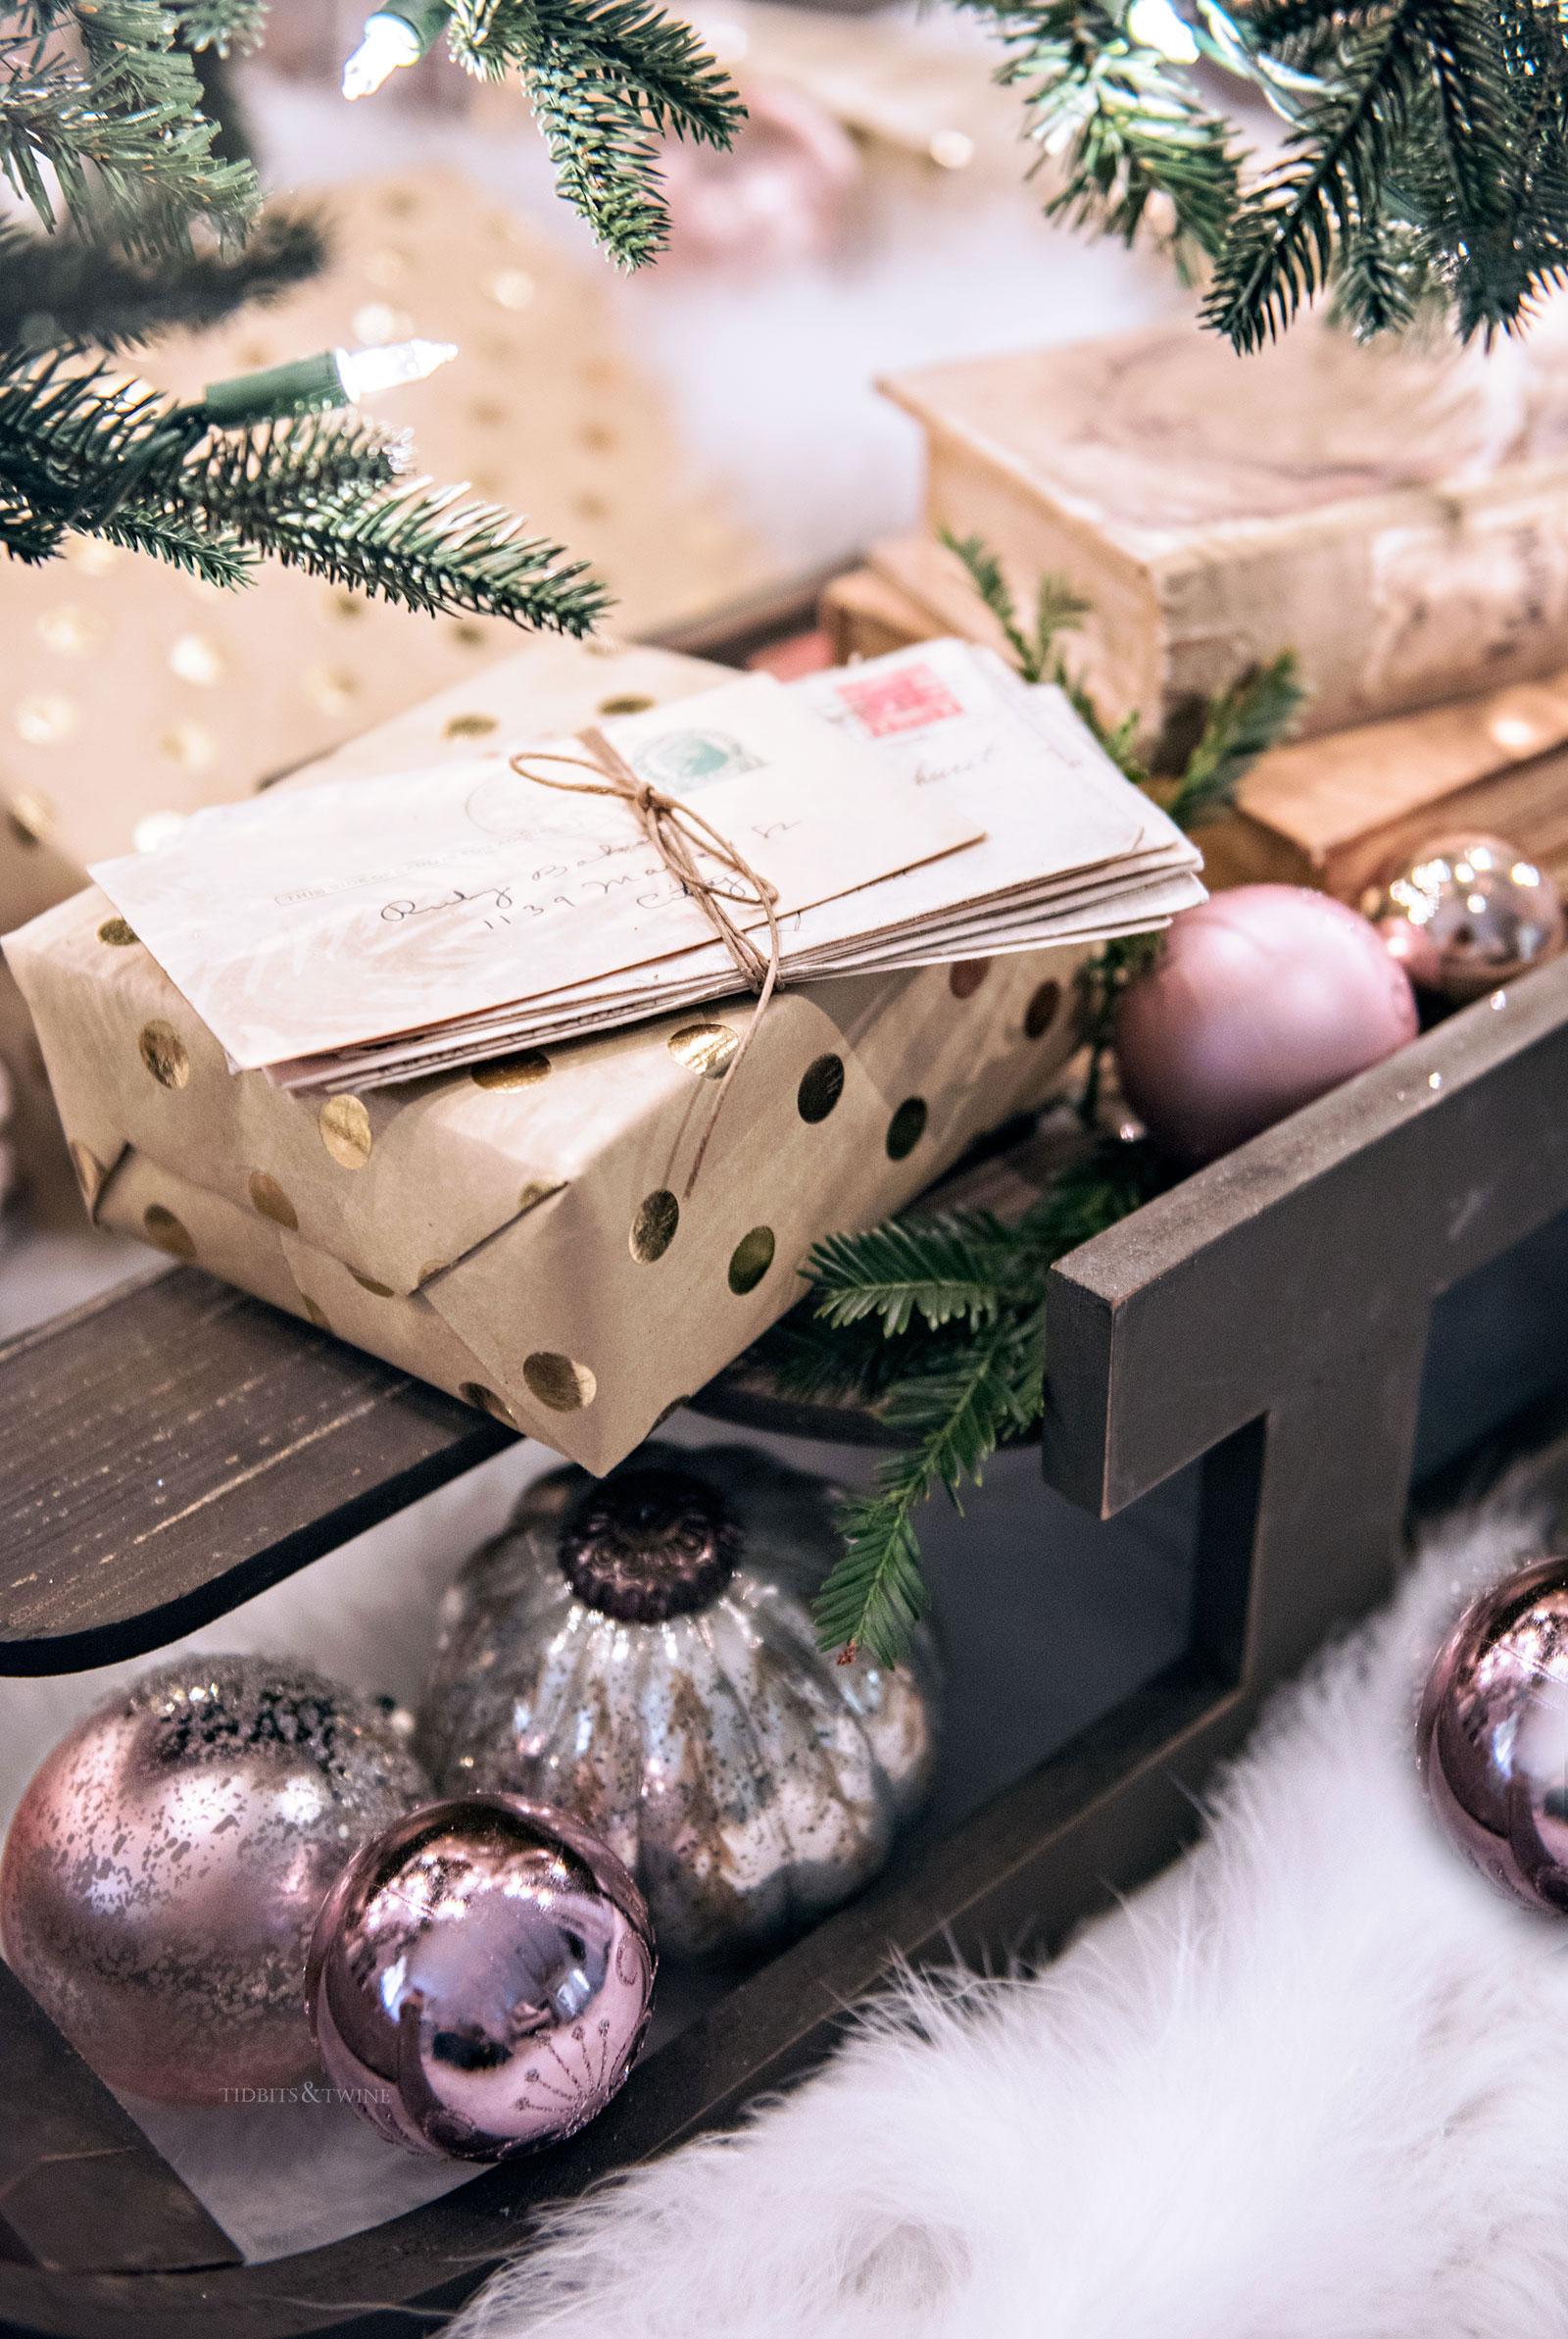 Wooden sled Christmas tree display